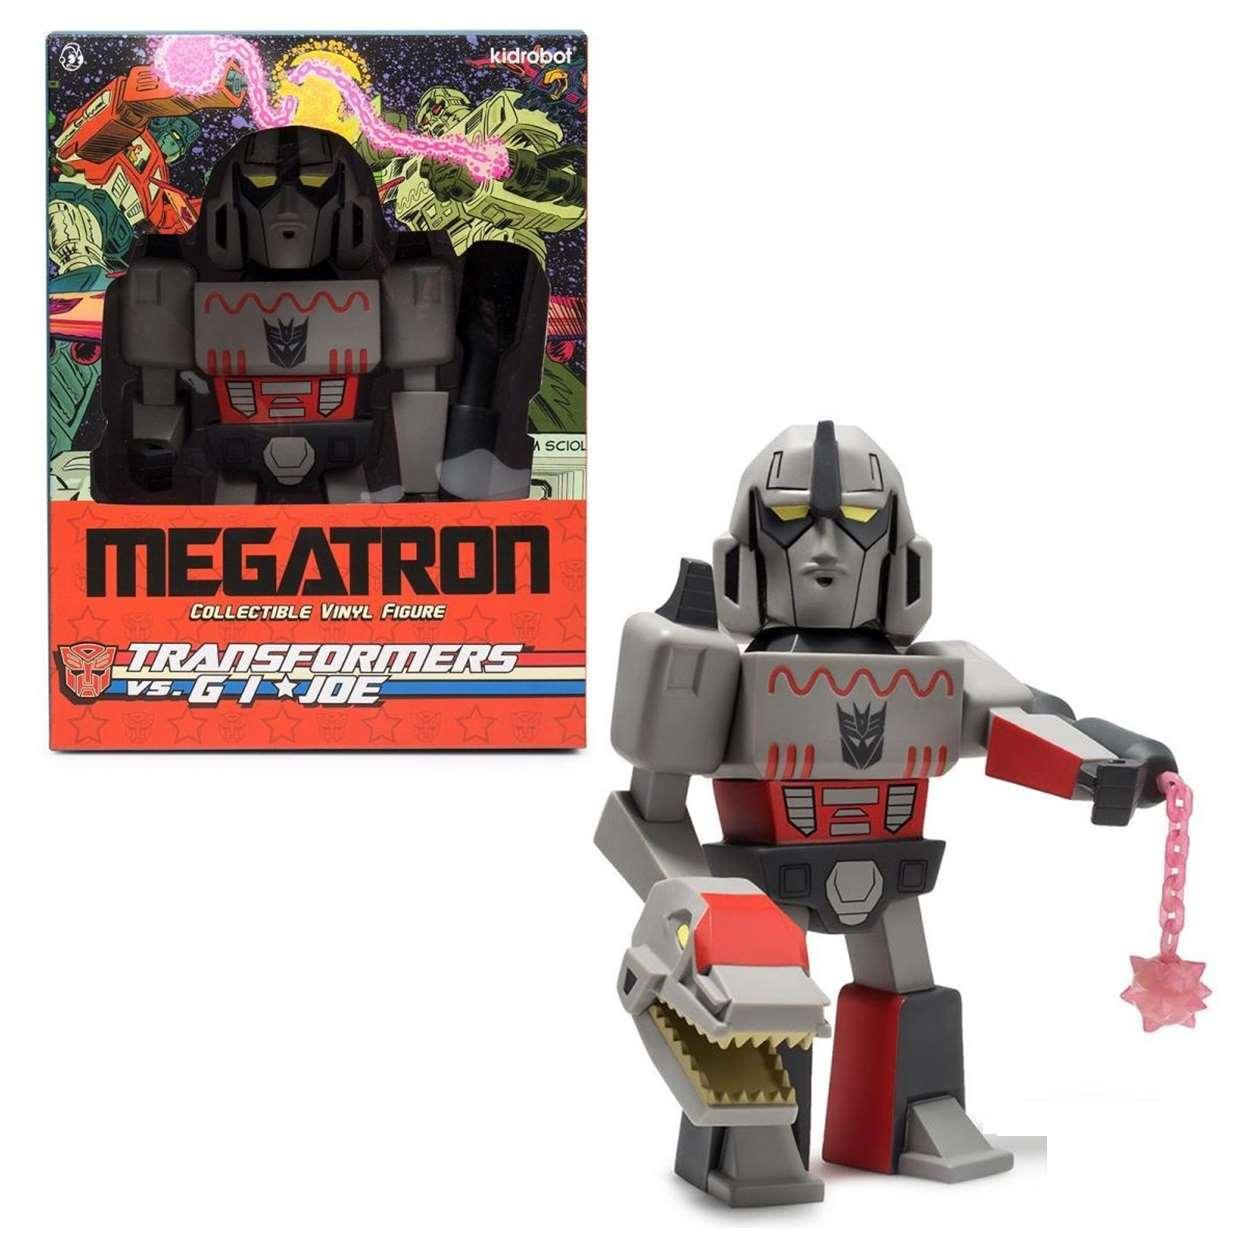 Transformers Vs. G.I. Joe Megatron Limited Edition Kidrobot